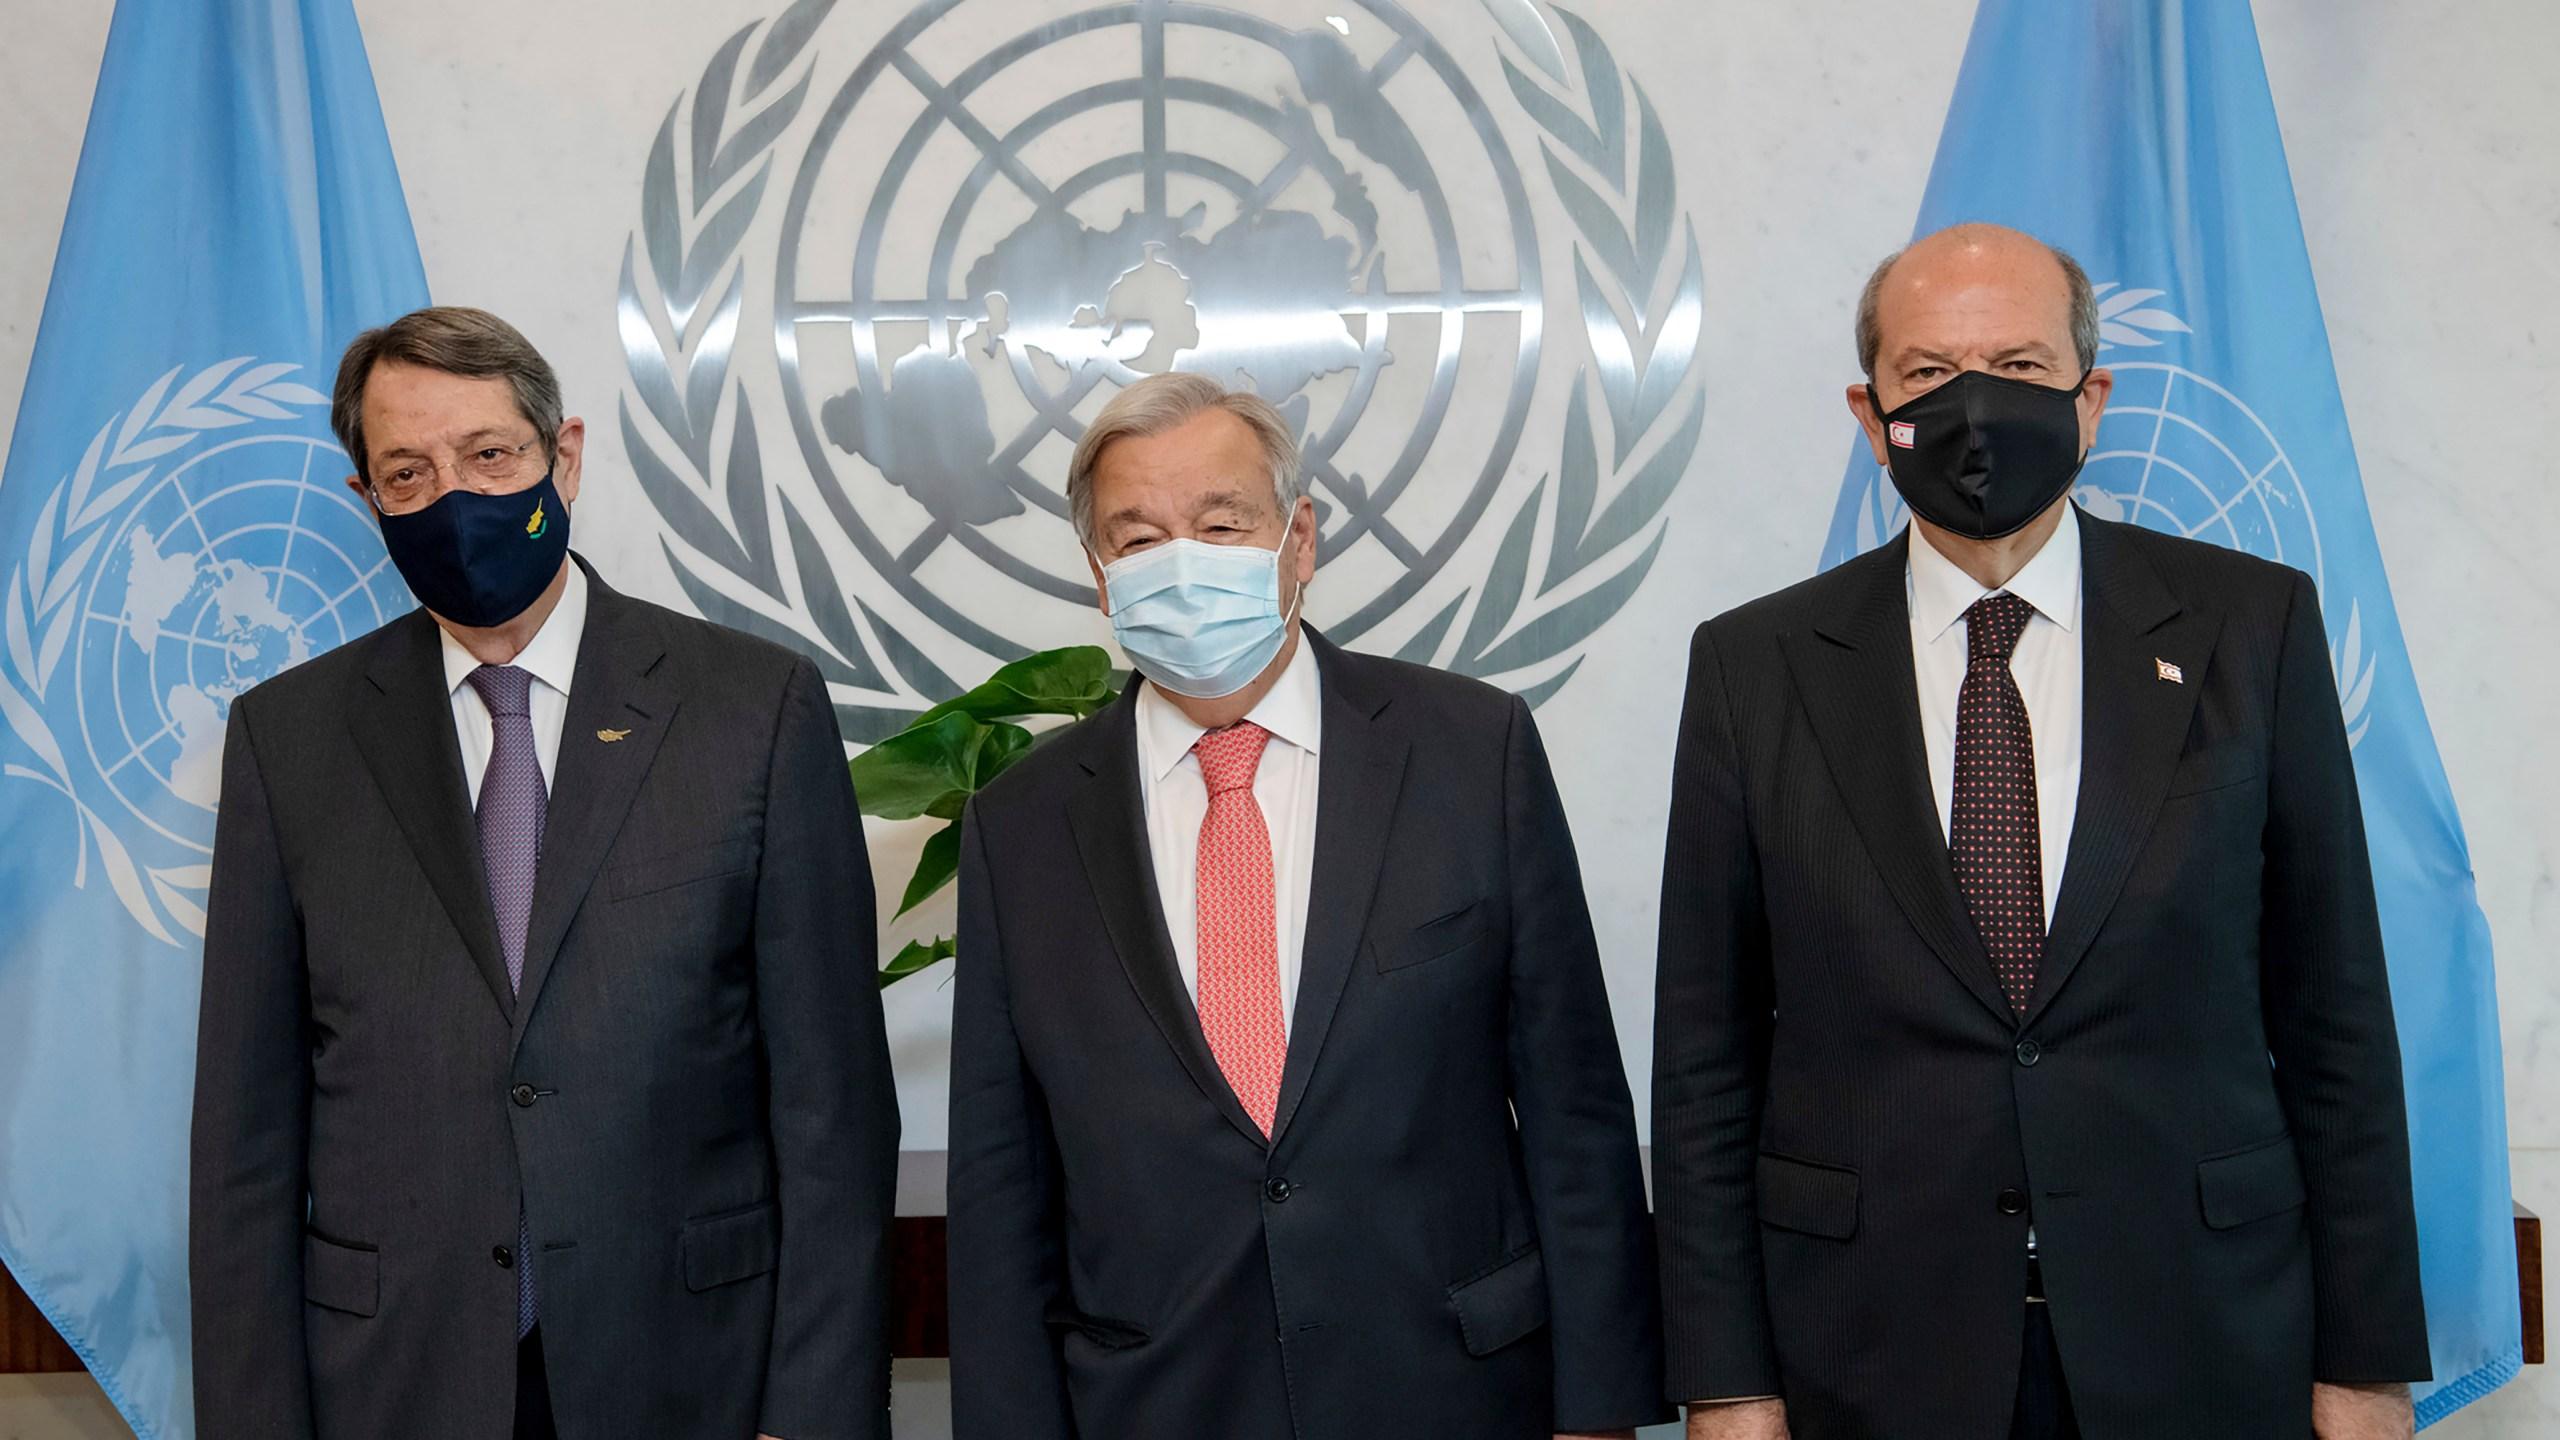 Antonio Guterres, Nicos Anastasiades, Ersin Tatar, Secretary-General Meets Greek Cypriot and Turkish Cypriot Leaders, new york